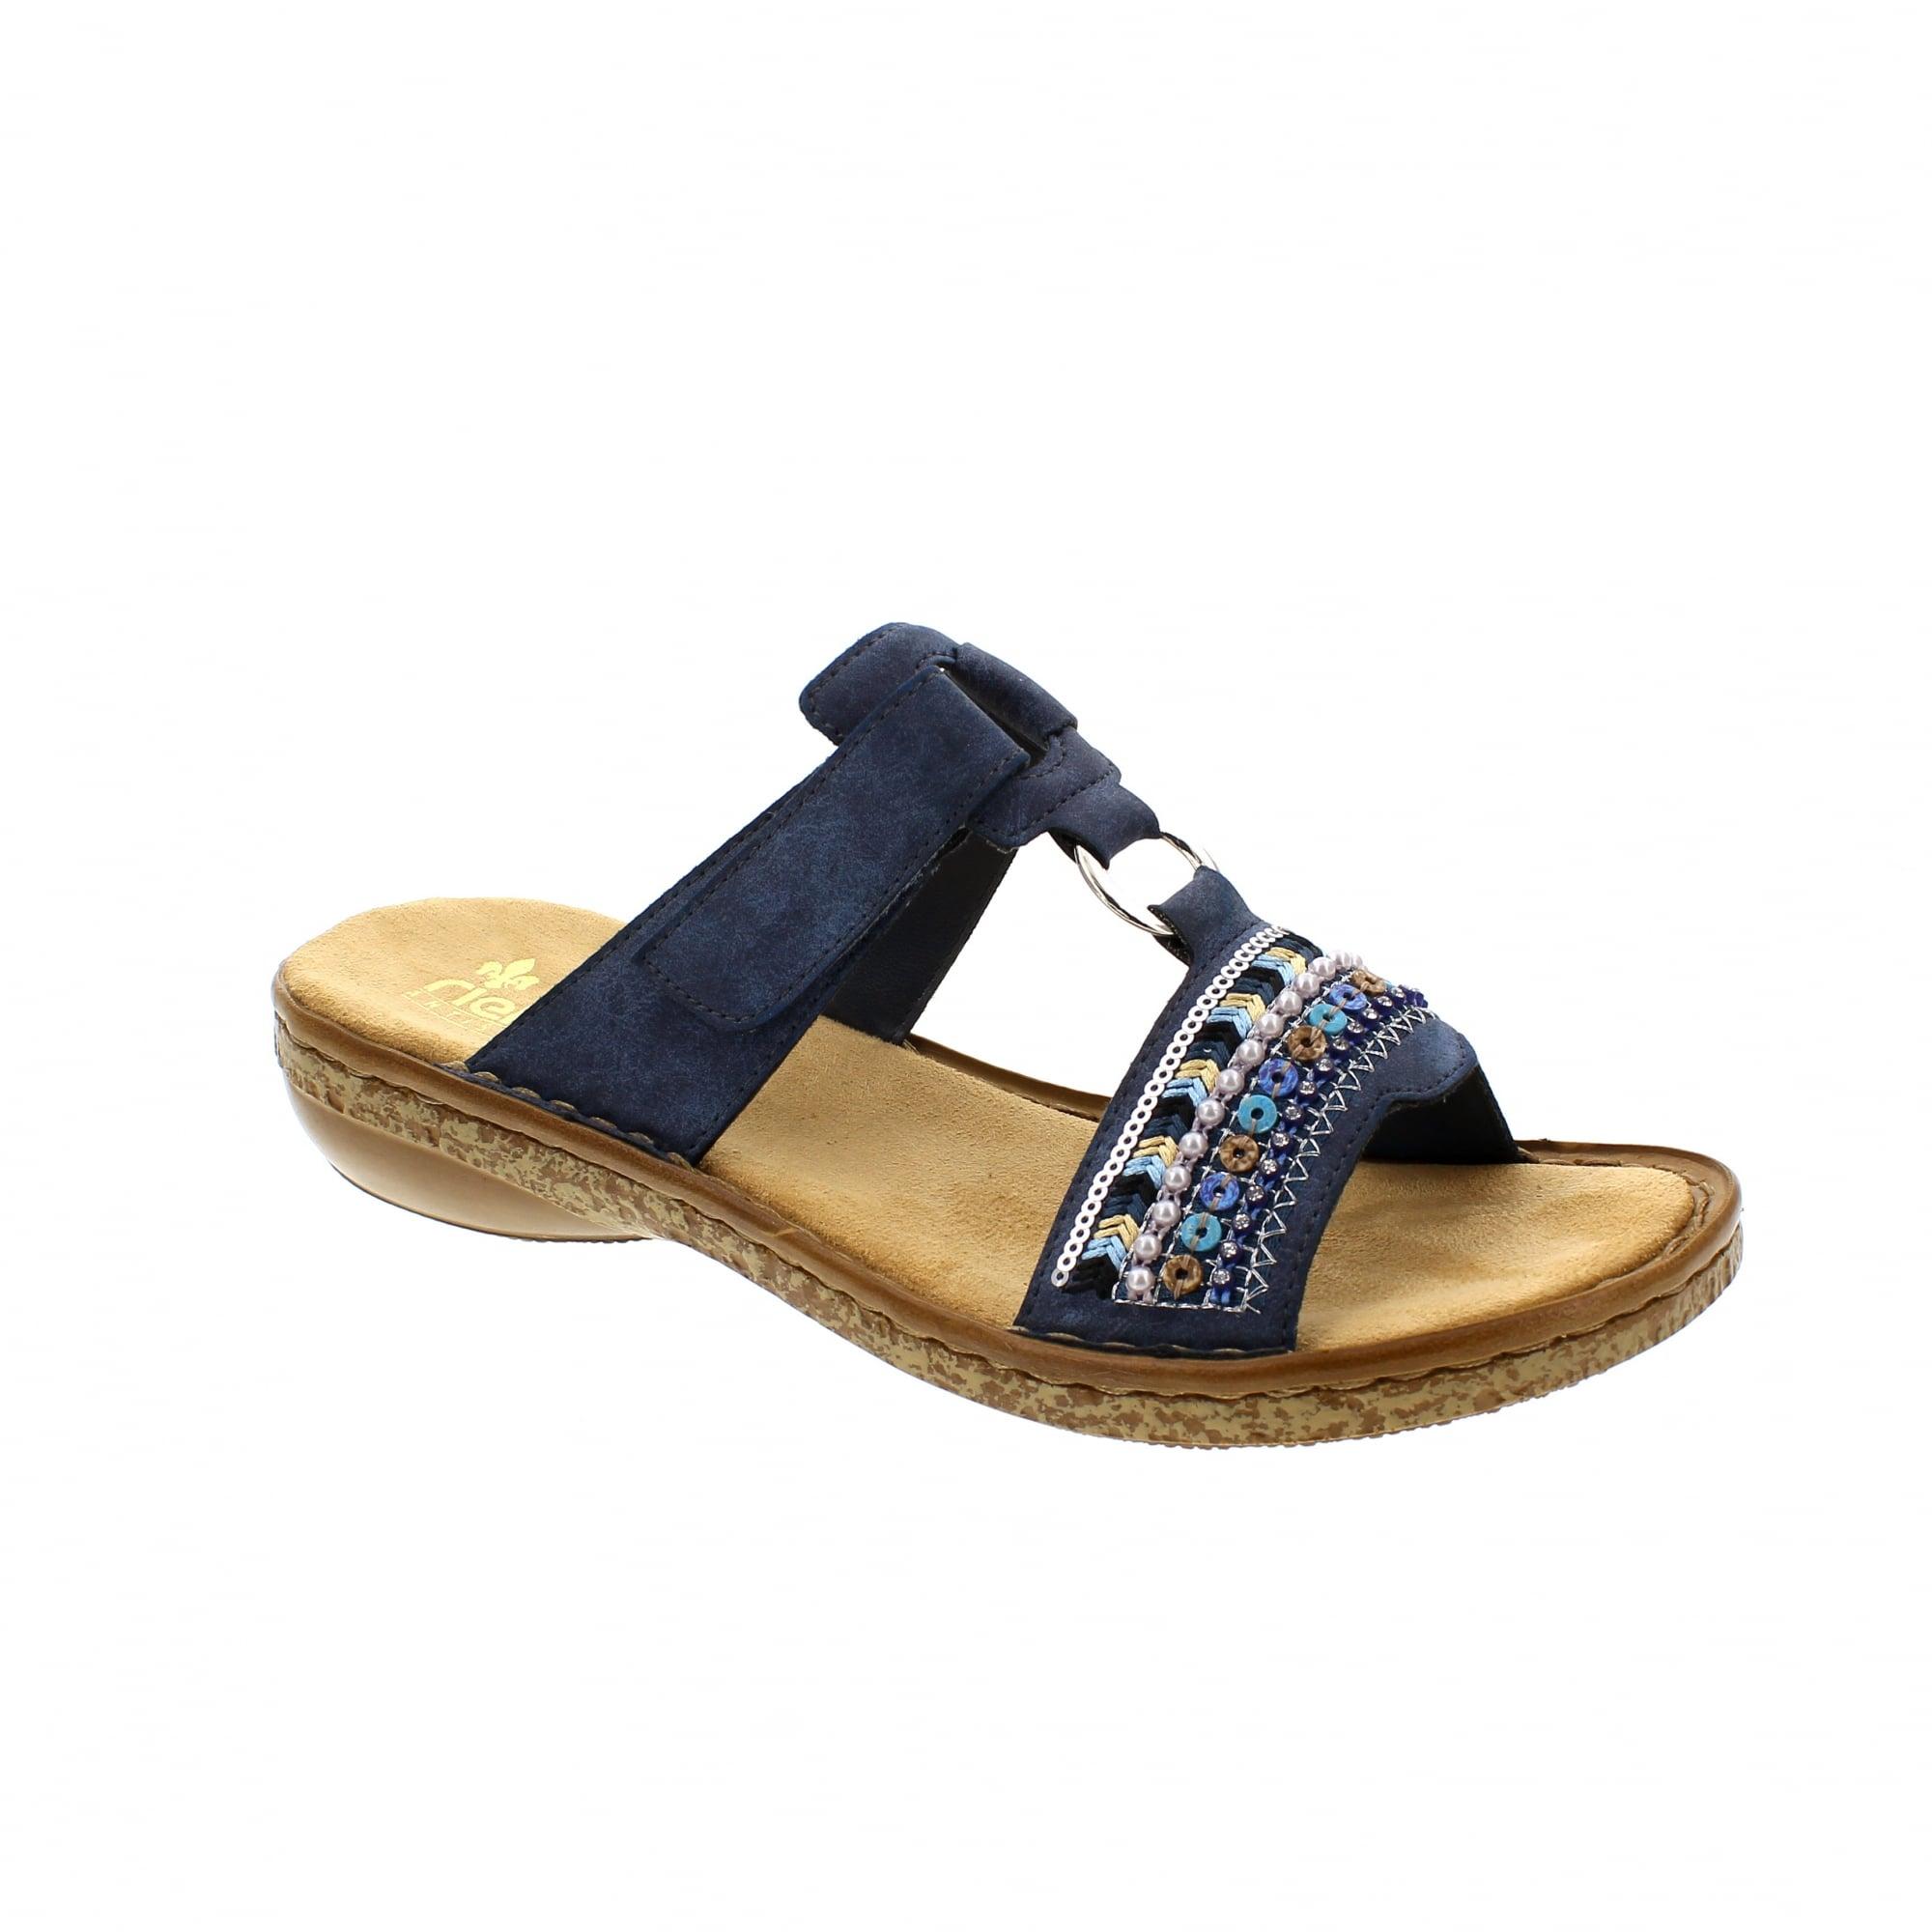 607fee6c8cb Rieker 628M6-14 Navy Blue Womens Mule Sandals